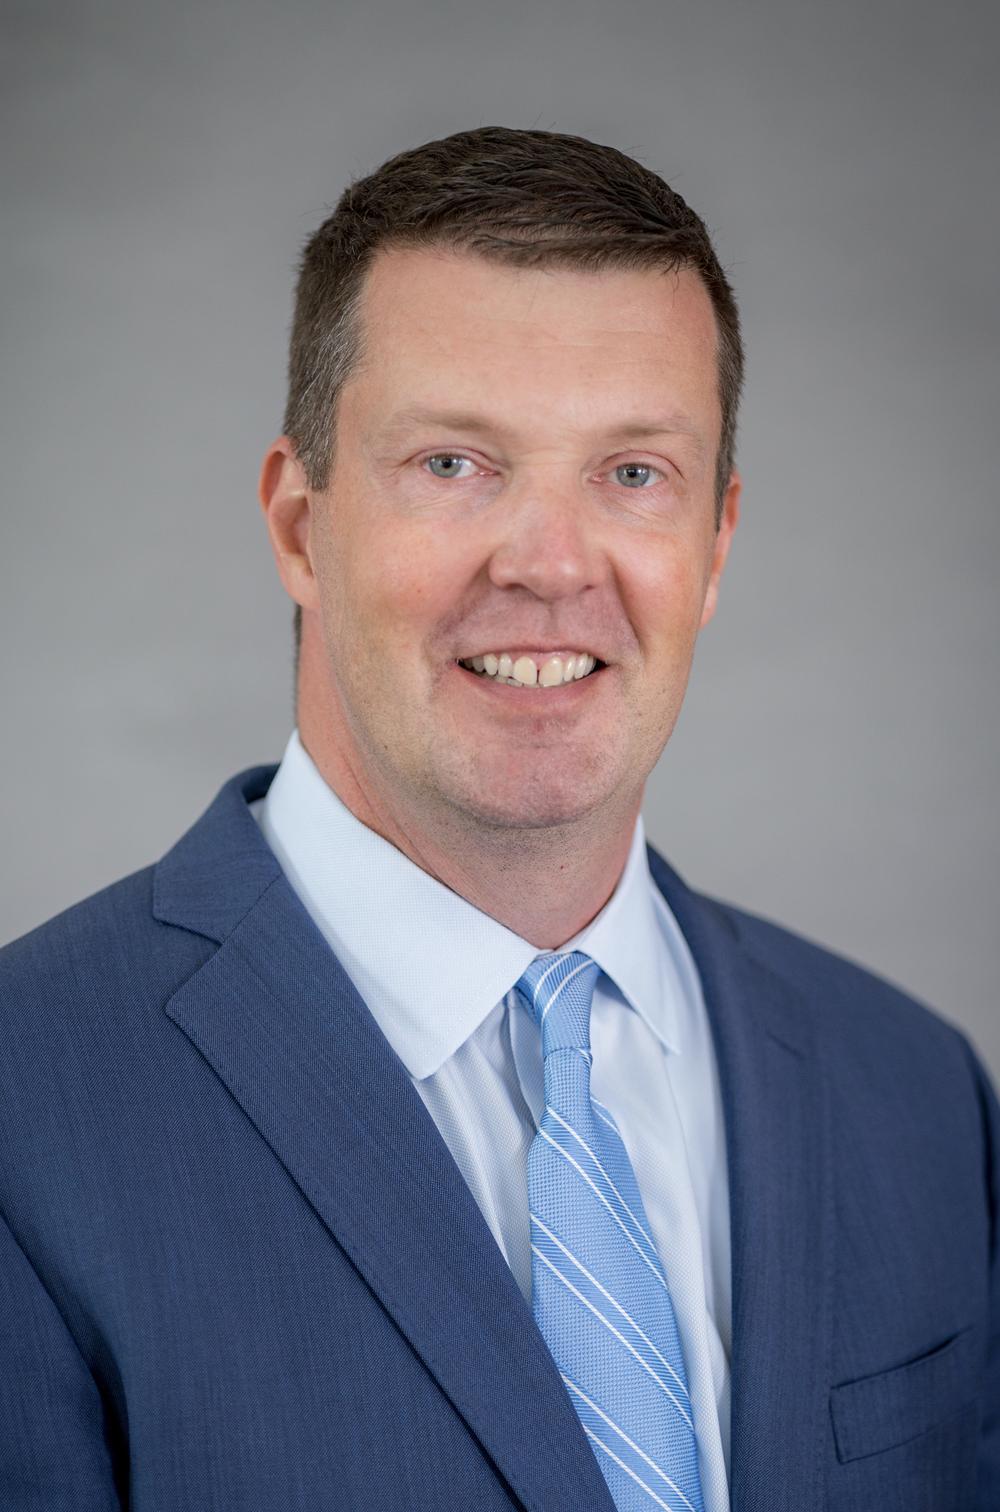 Patrick McNamara, CFP® Photo